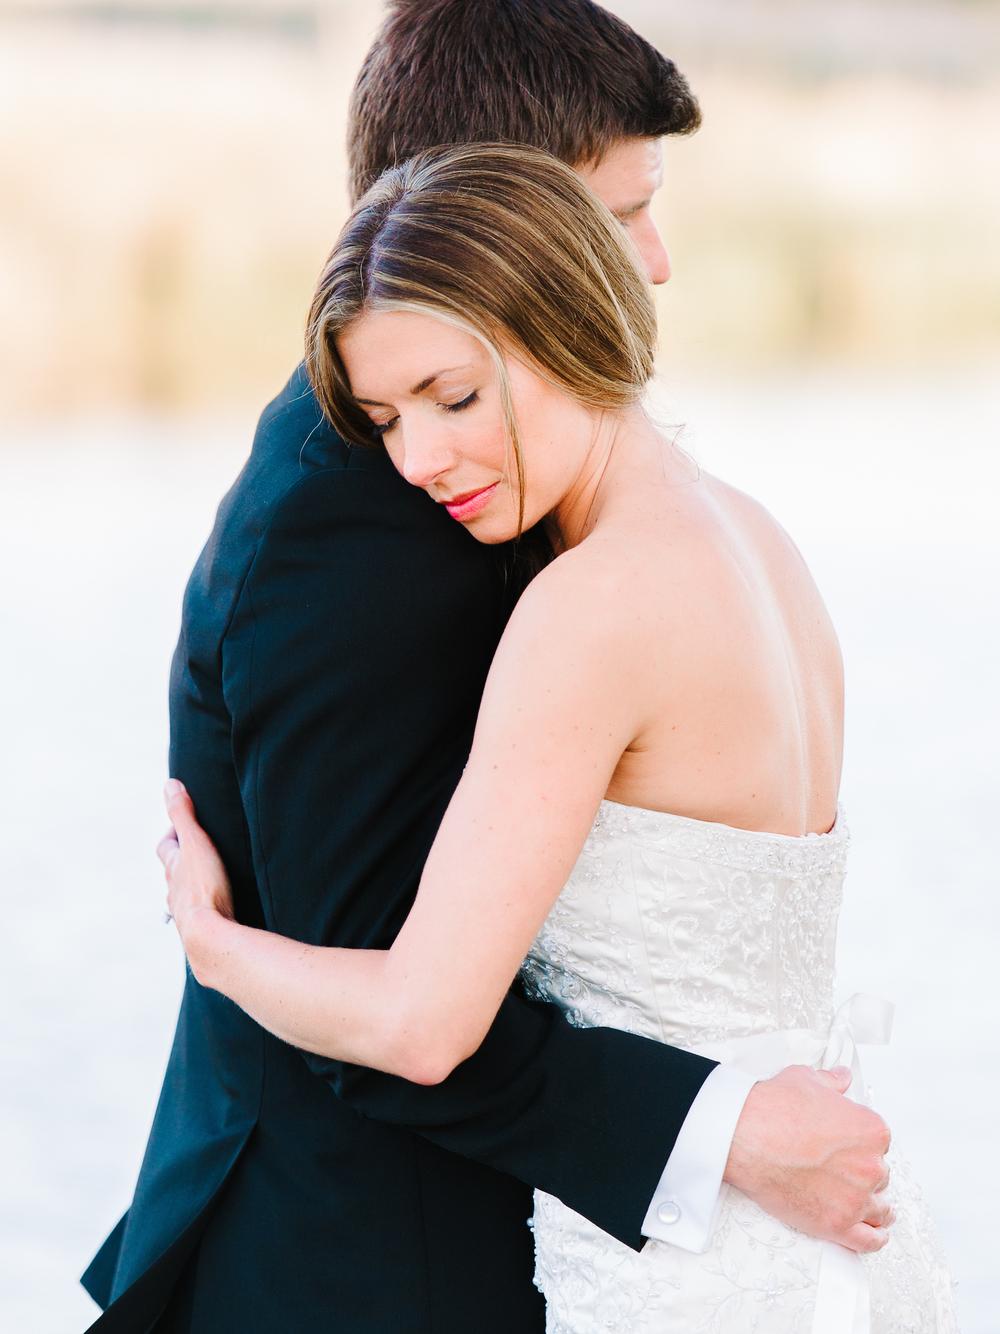 myrtle-beach-weddings-29.jpg